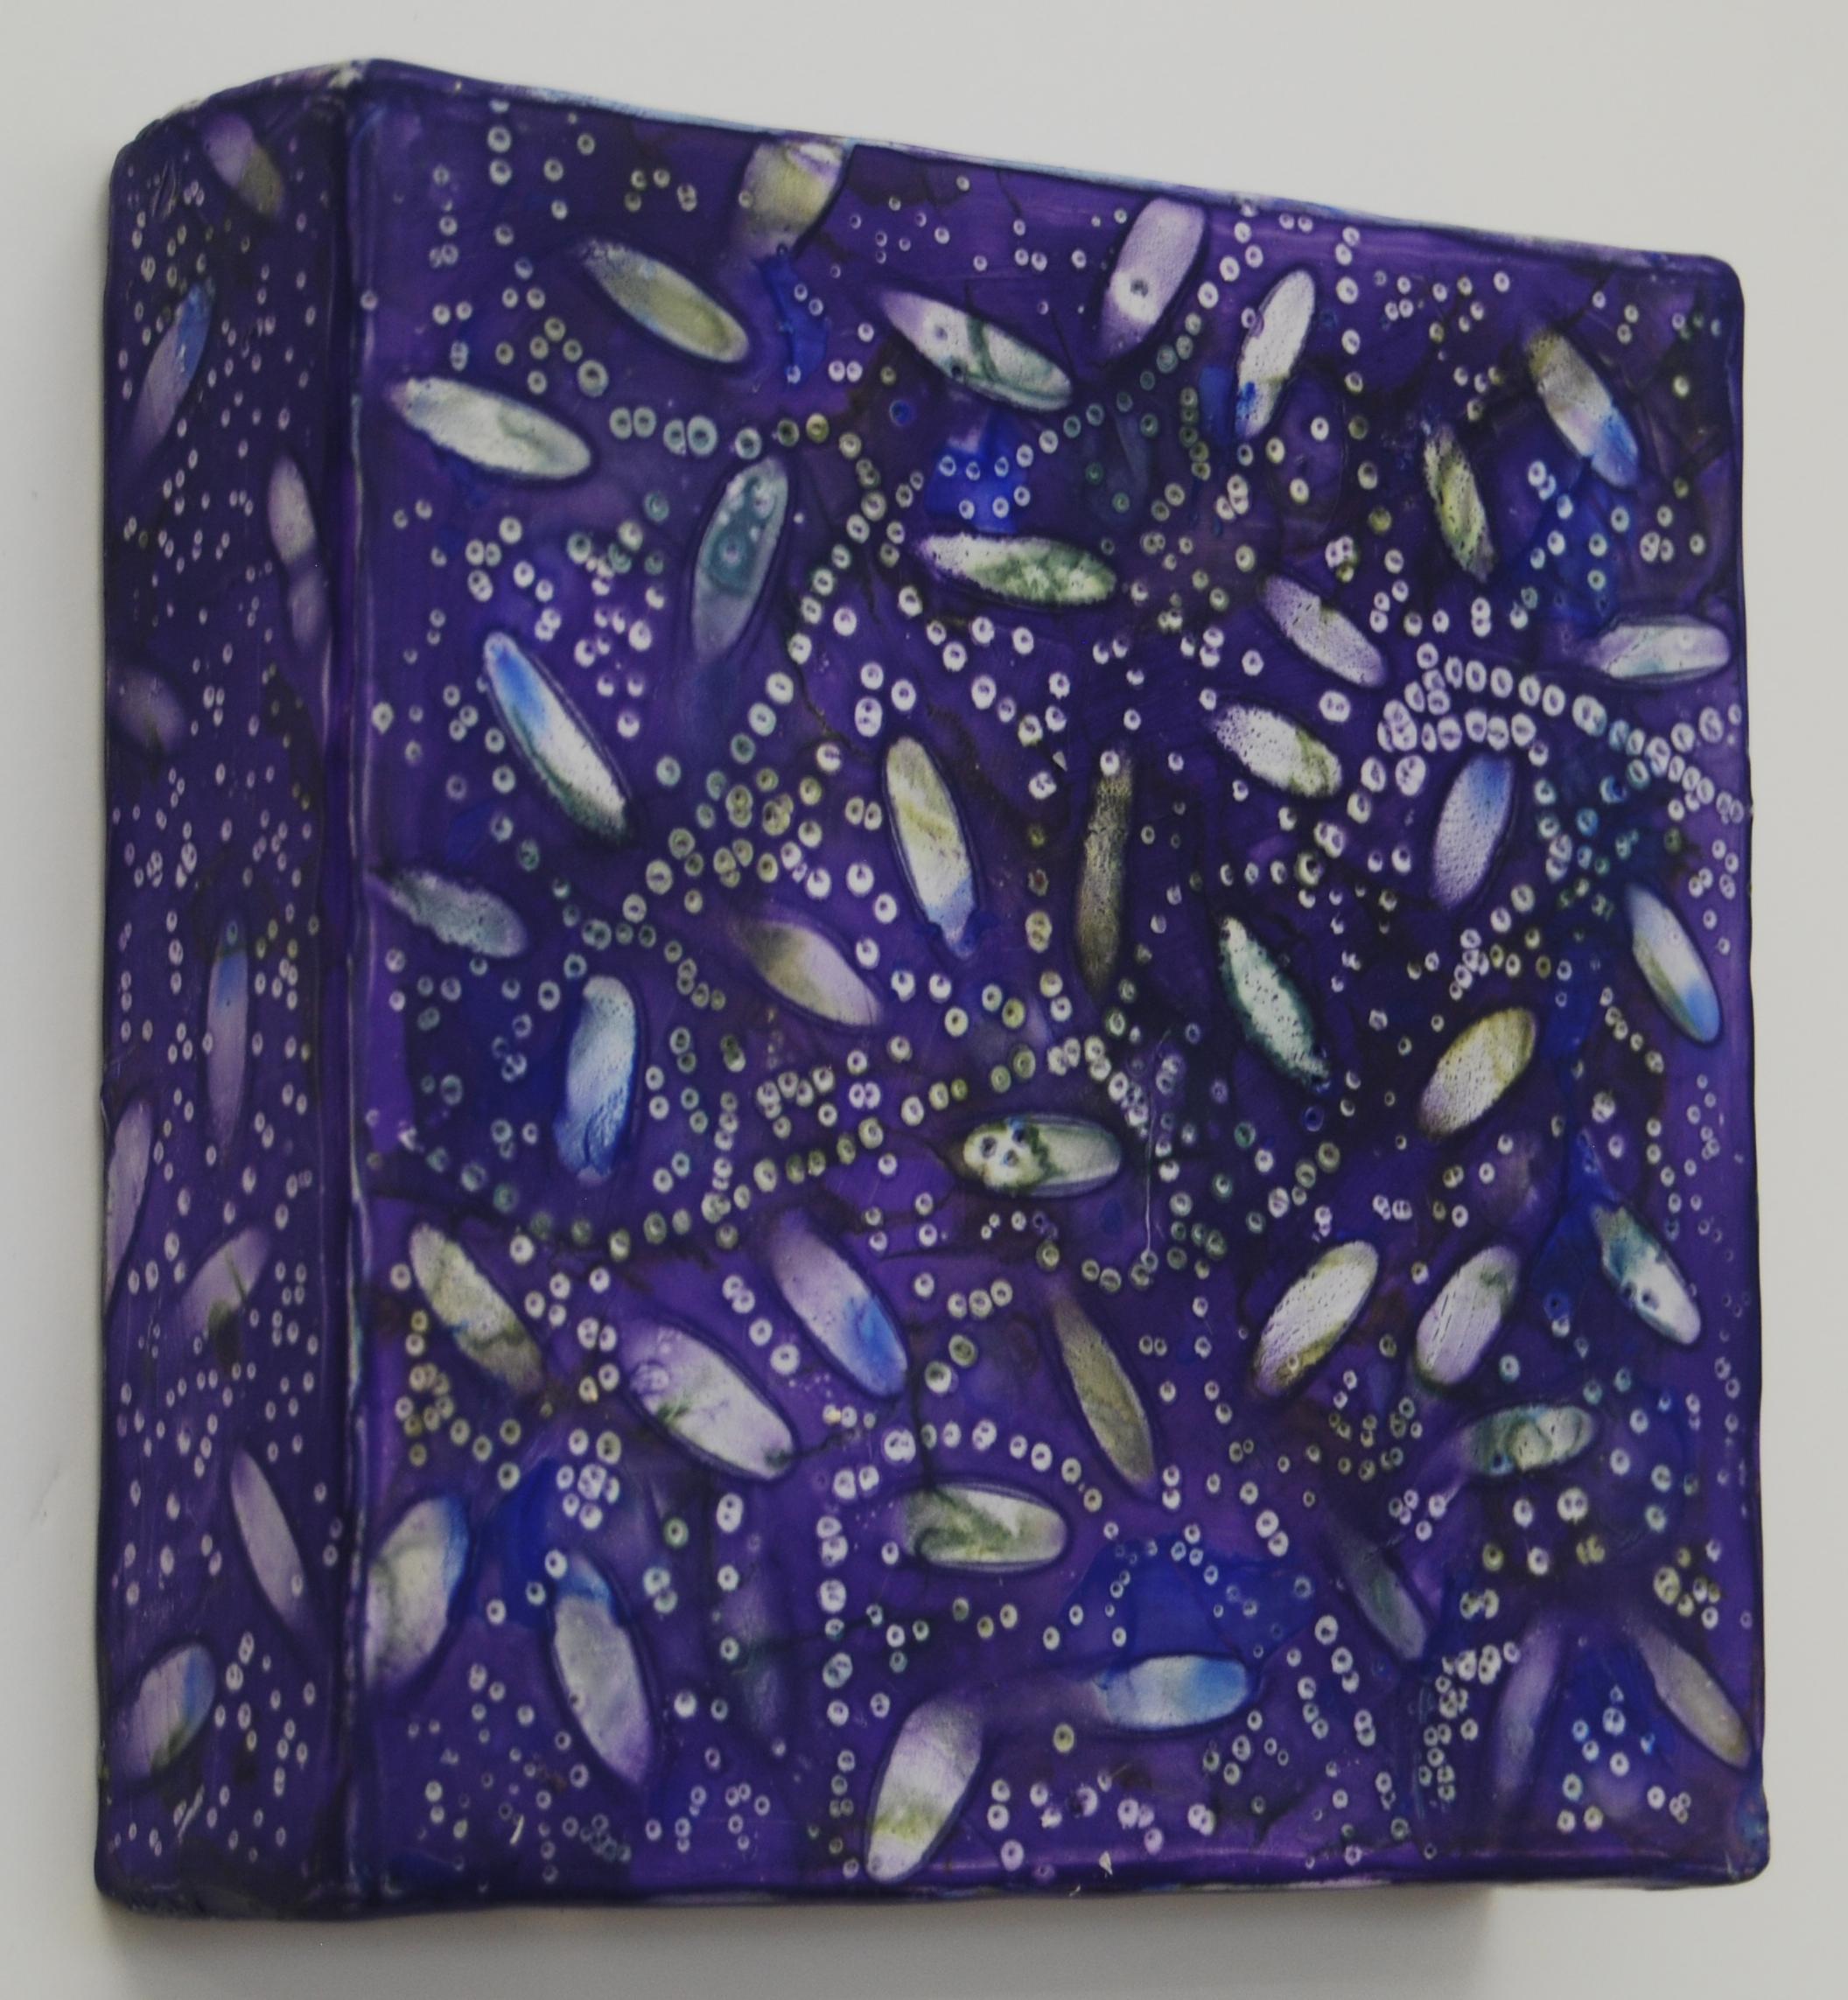 Kay Hartung,  Cell Patterns 7 , encaustic and mixed media, 6x6